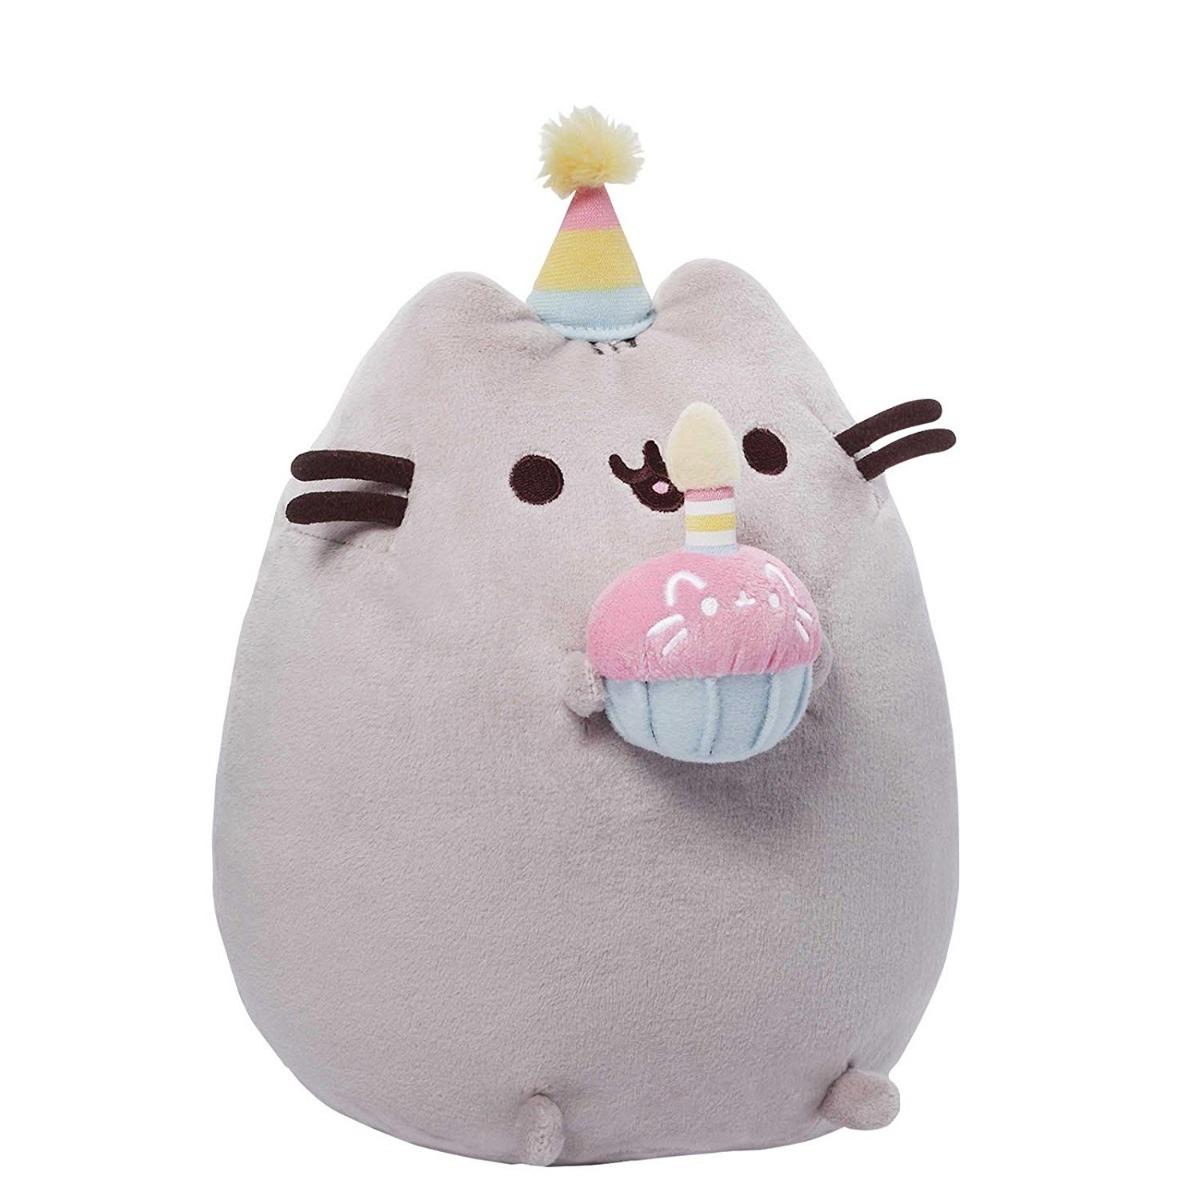 Peluche Pusheen Cupcake Cumpleanos Kawaii Atelier 1 130 00 En